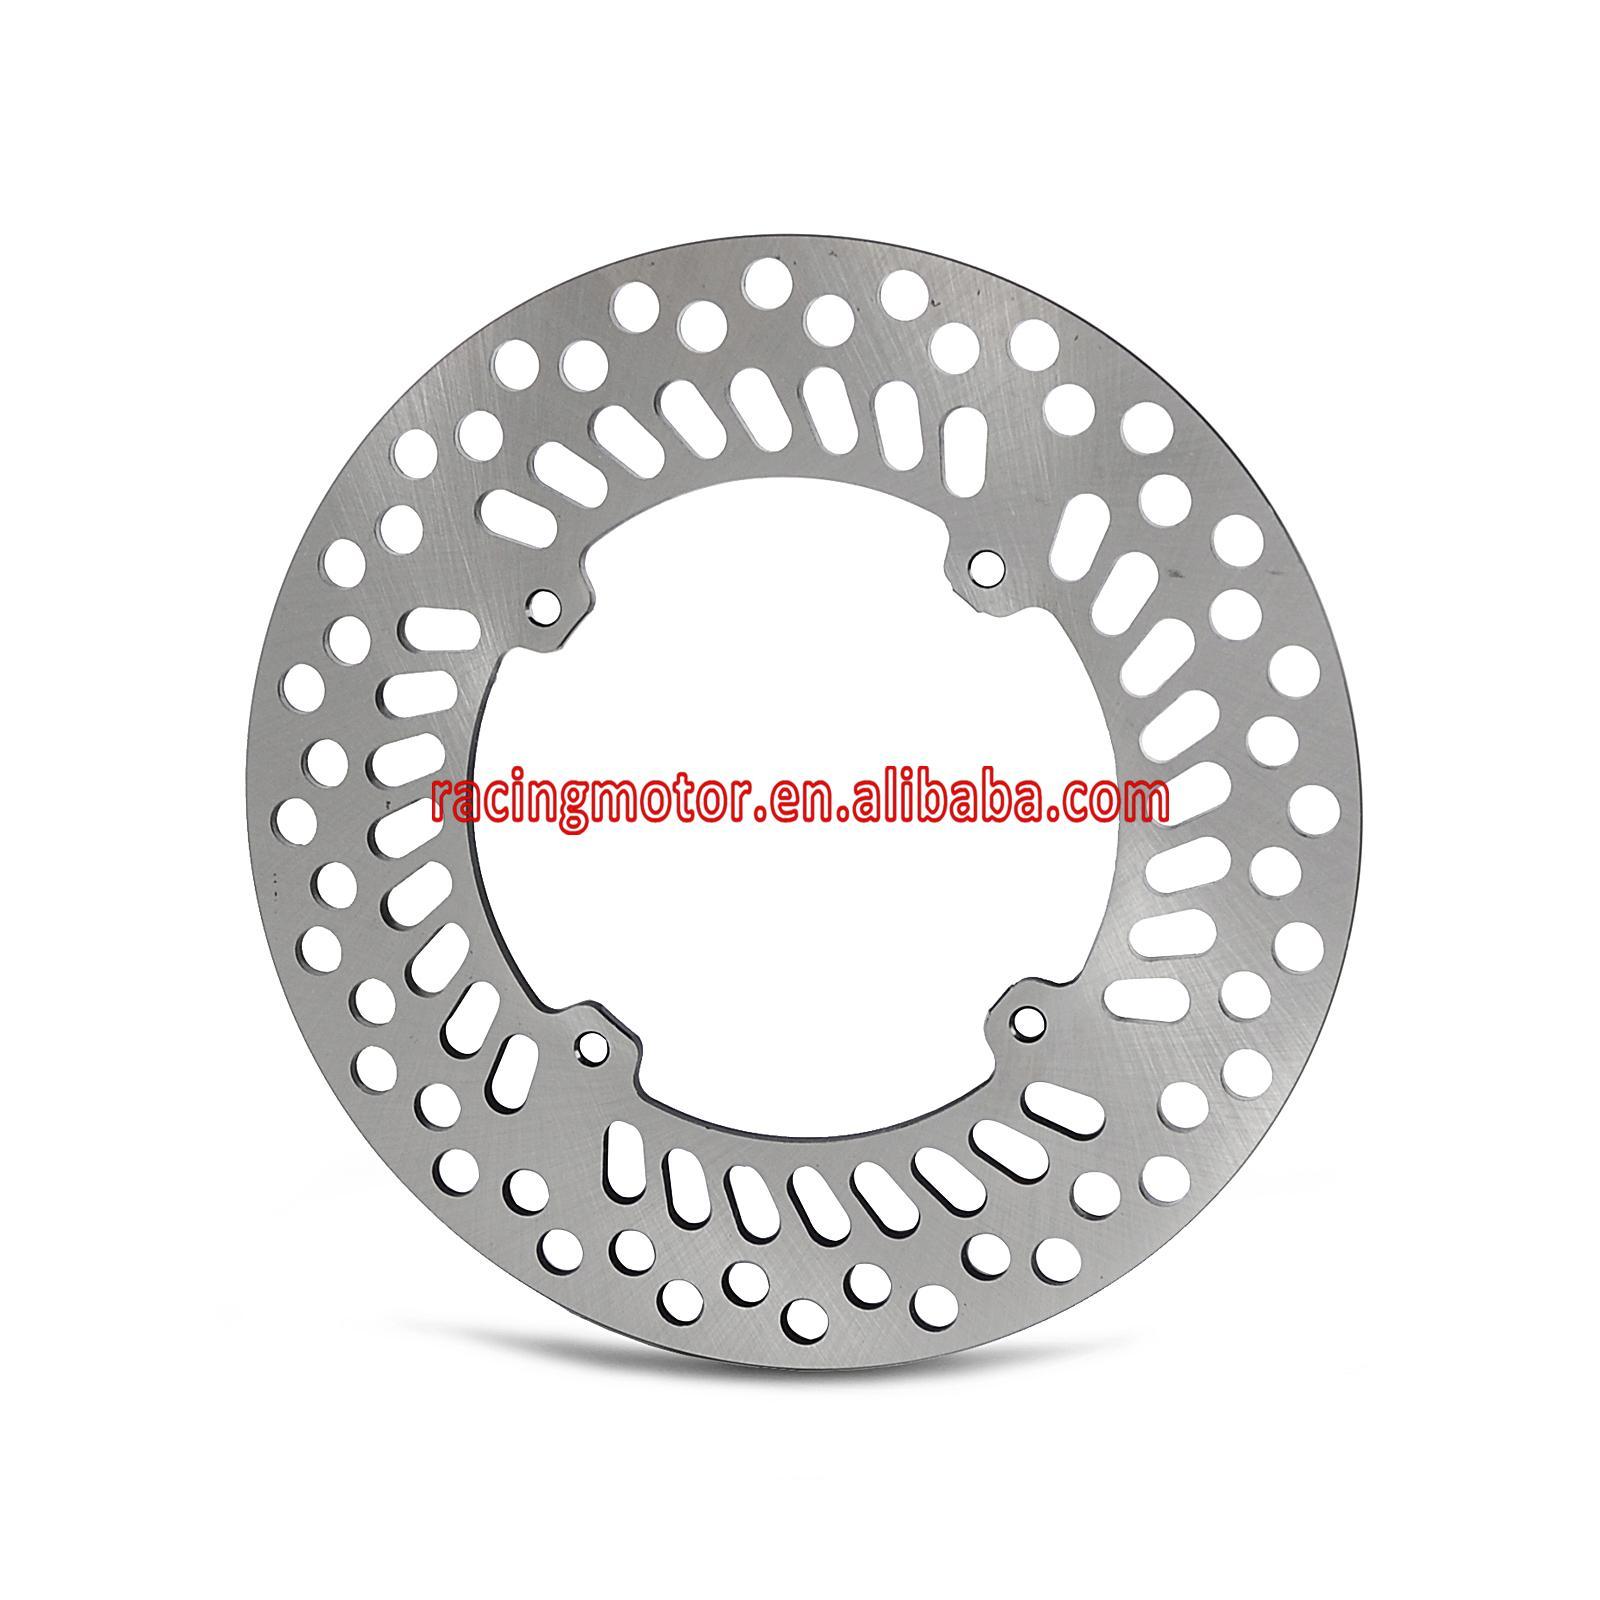 New Motorcycle Front Rotor Brake Disc For Honda CR125 250 500 MTX125 200 XR250 600 XL125 600 MTX 125 RWE/RWF/RWH/RWL 85-95 front brake disc for honda steed 400 600 motorcycle parts